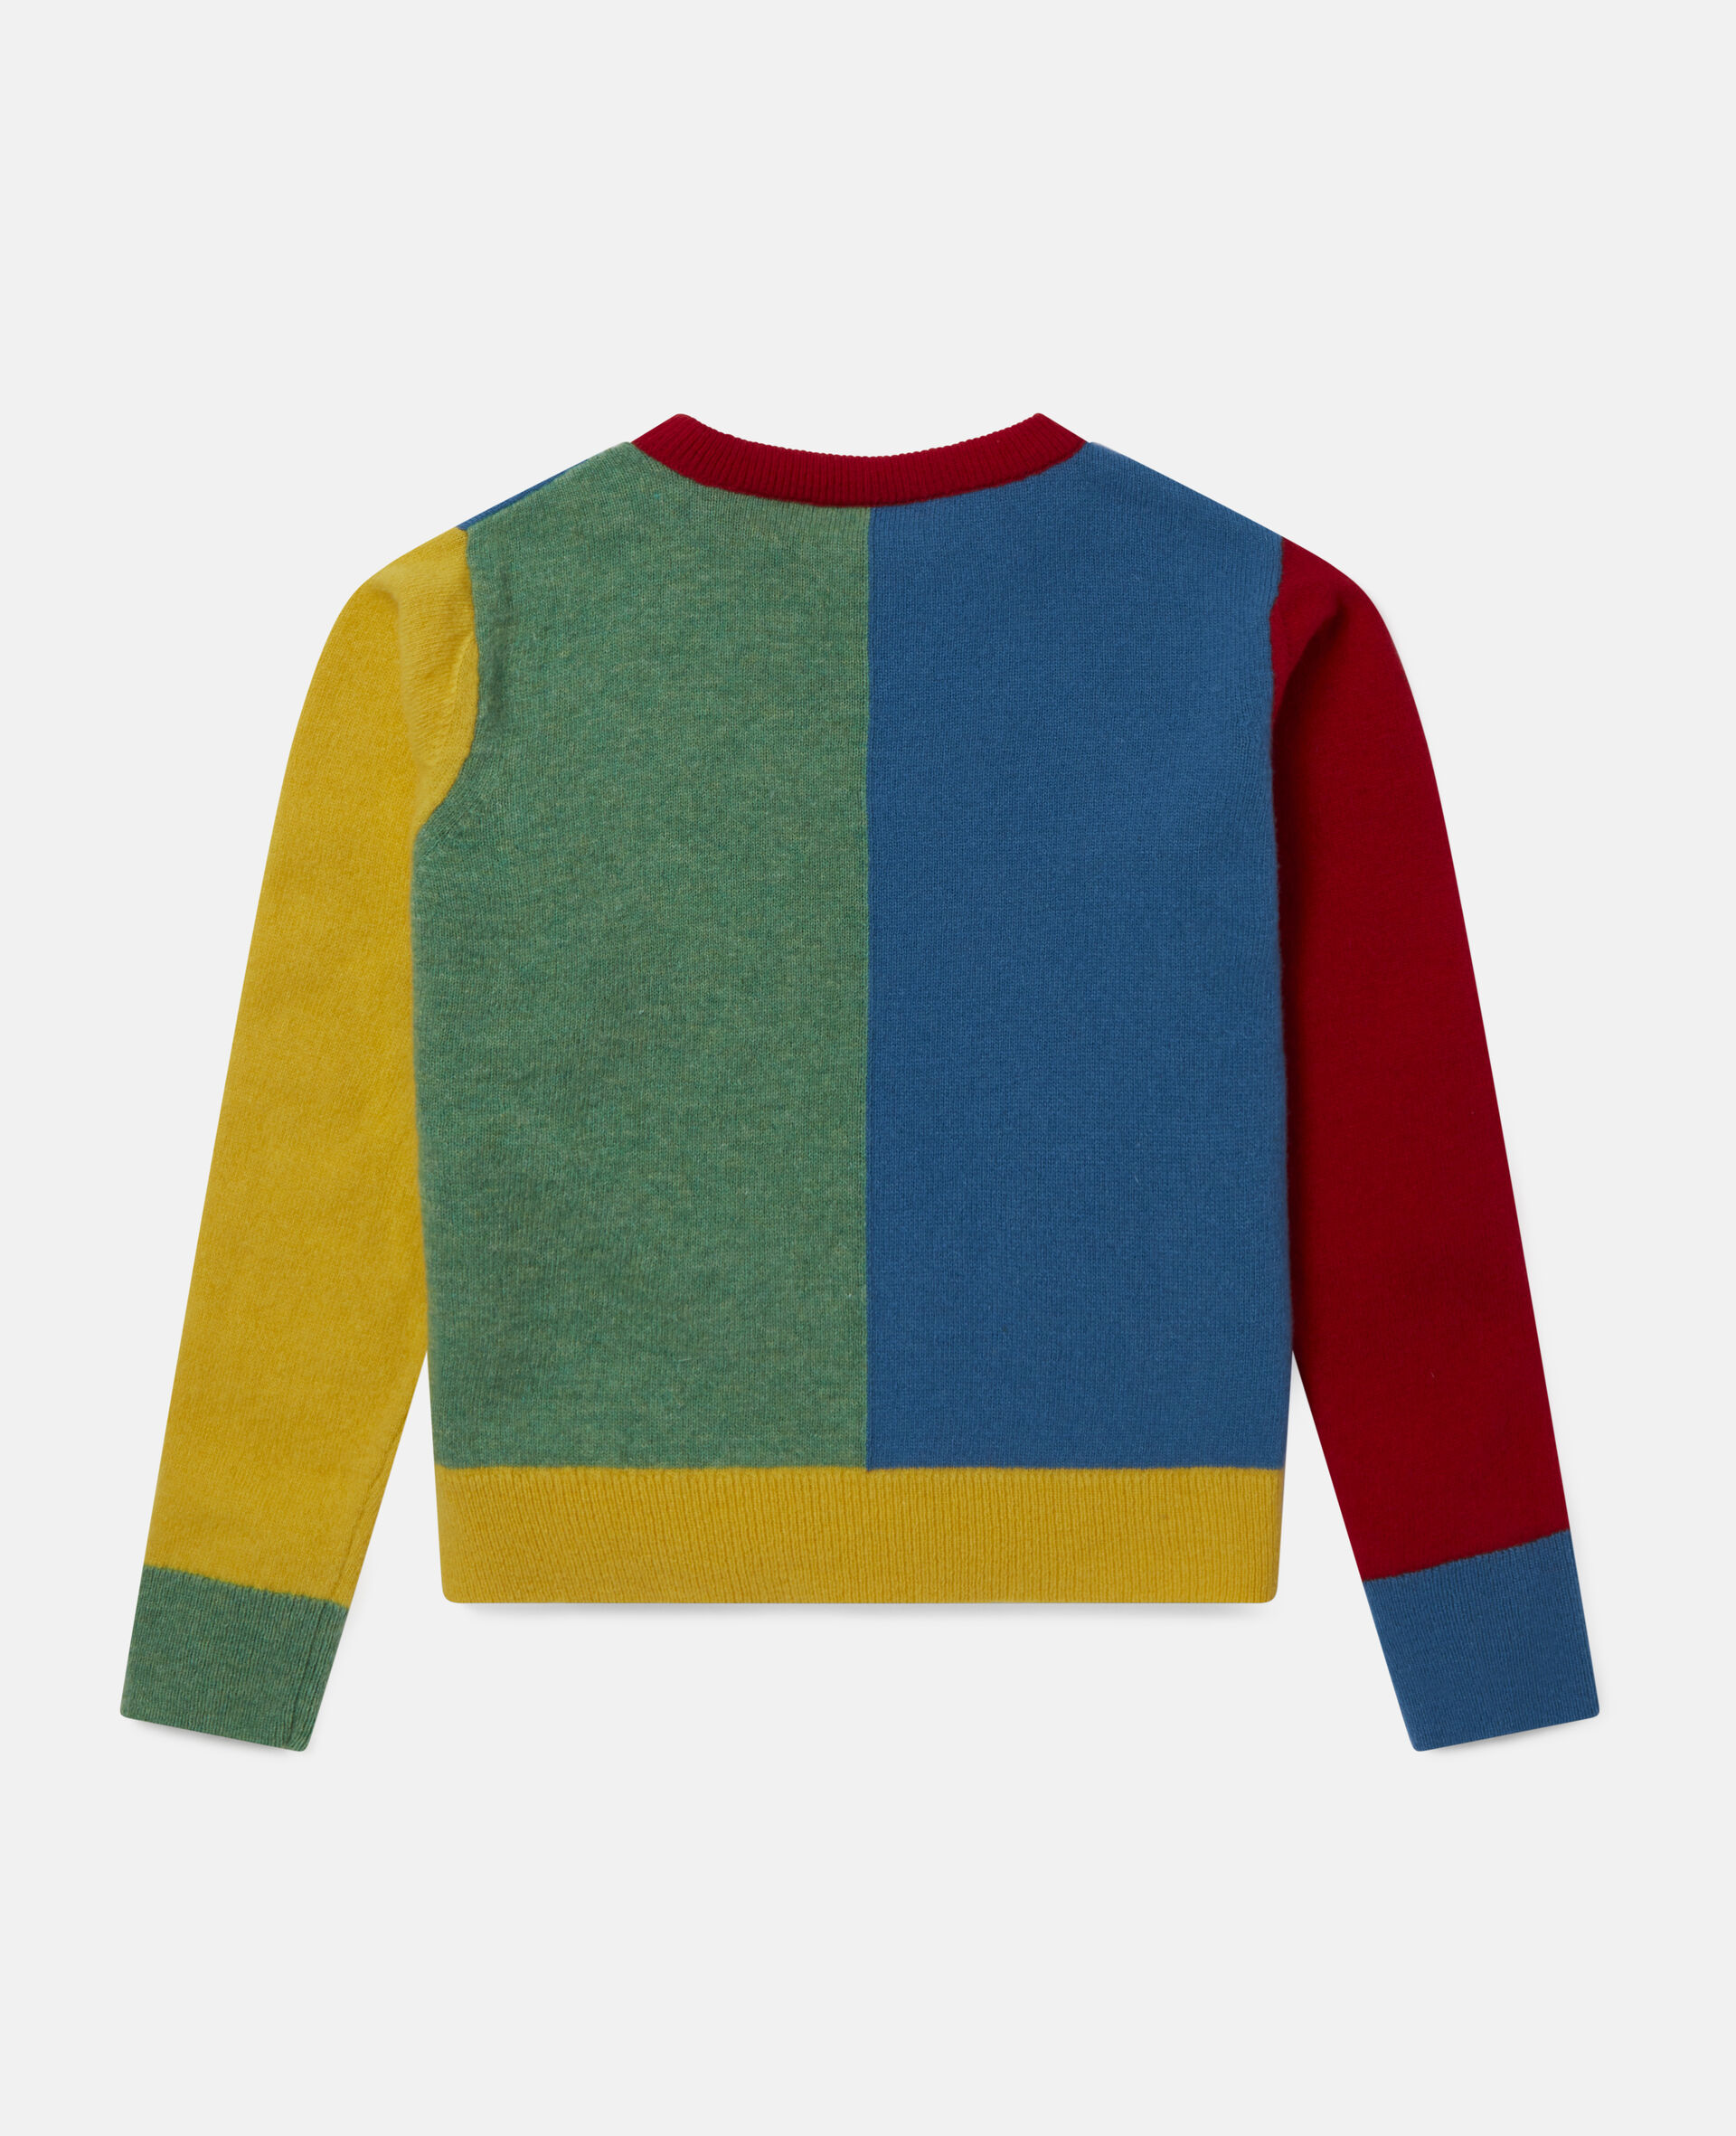 Colourblock Knit Intarsia Jumper -Multicolour-large image number 3